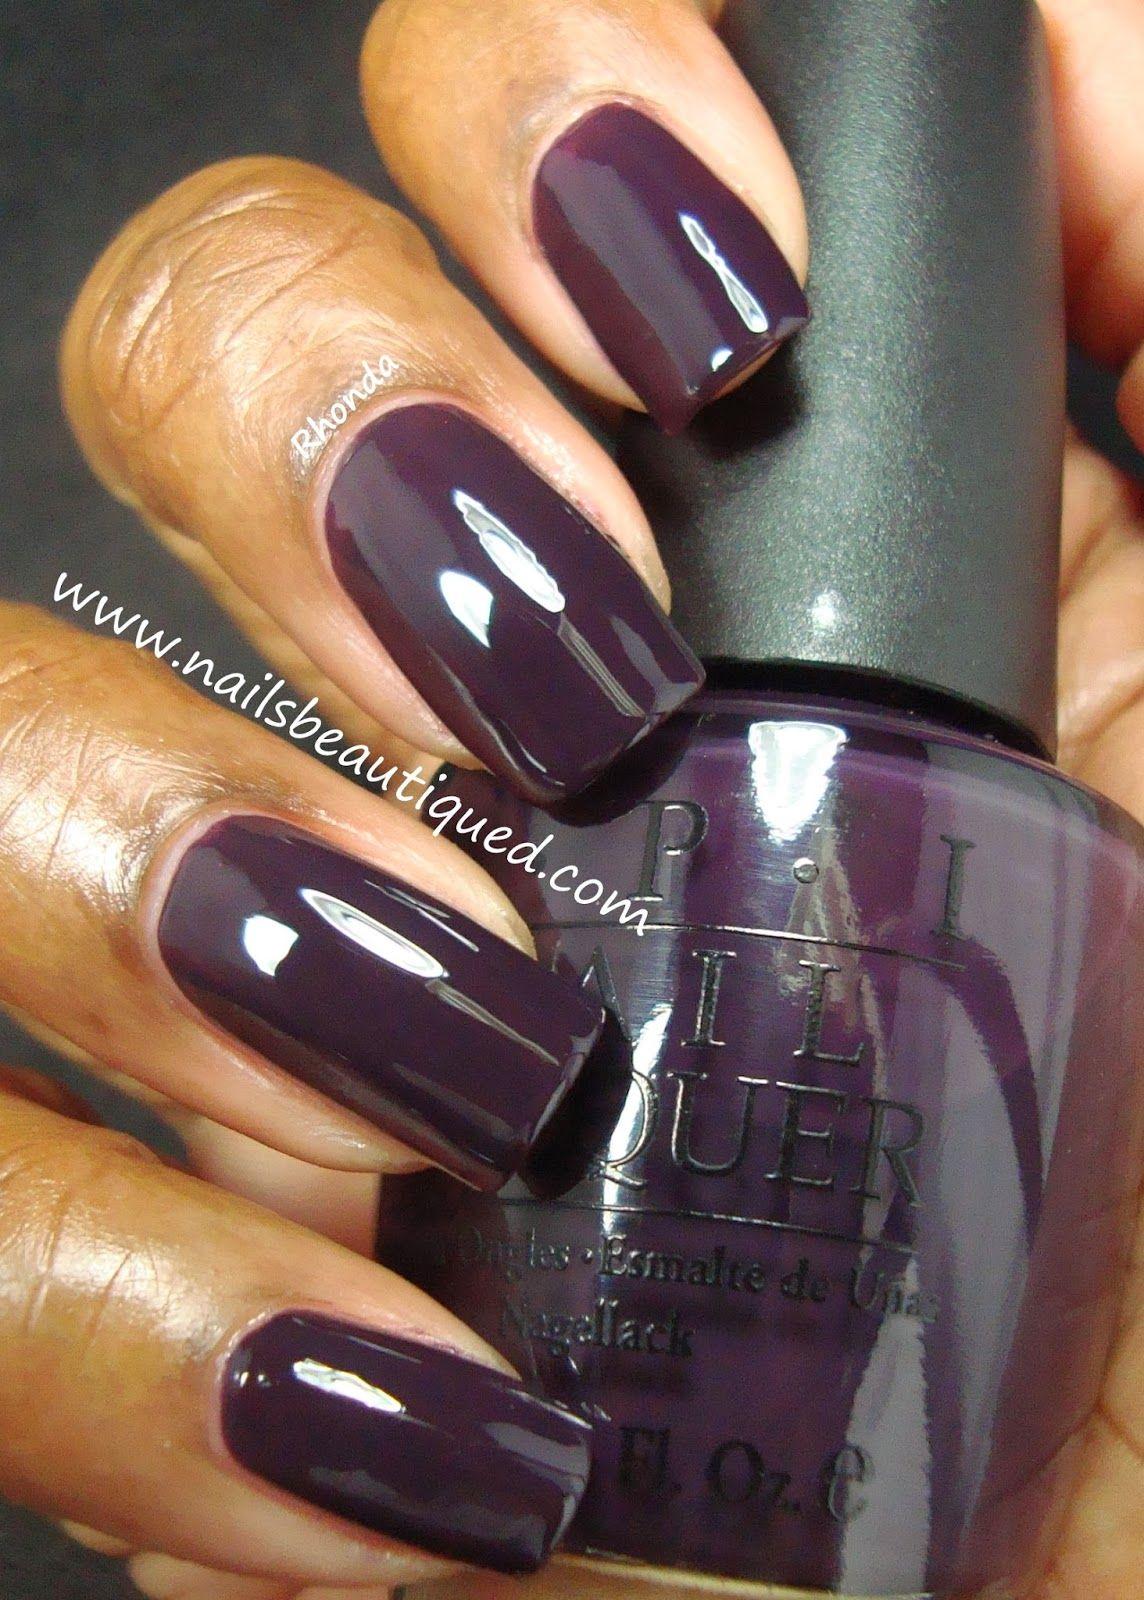 Manicure Trends Fall-Winter 2014-2015 | Beauty Tips